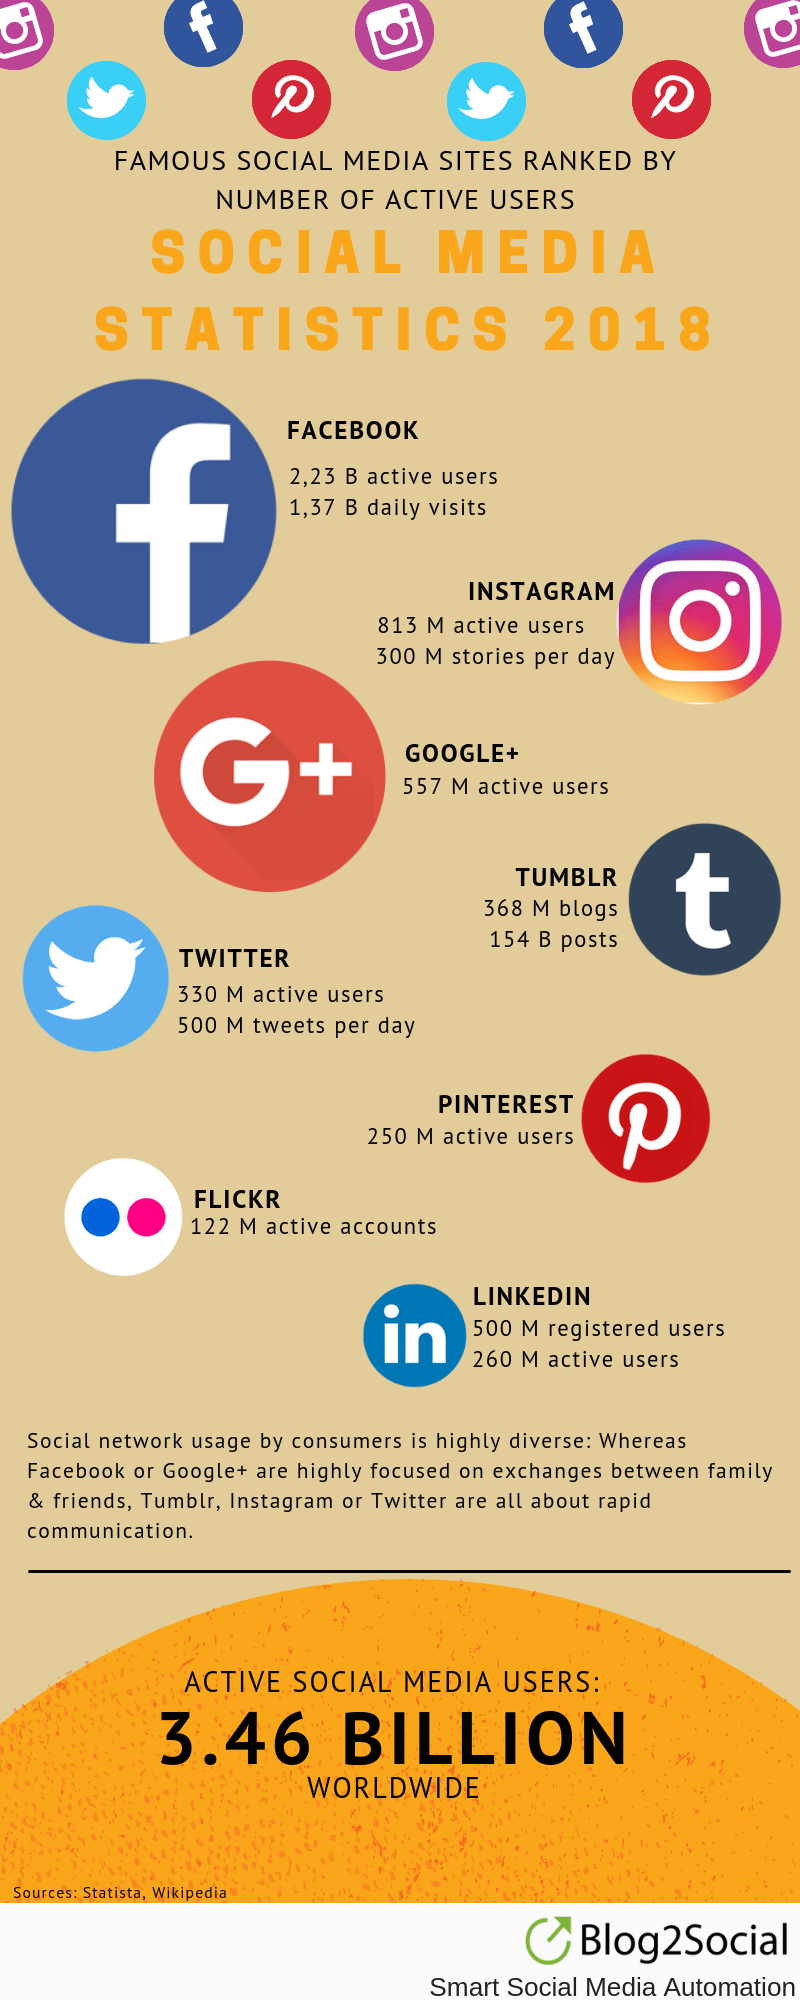 social-media-networks-statistics-active-users